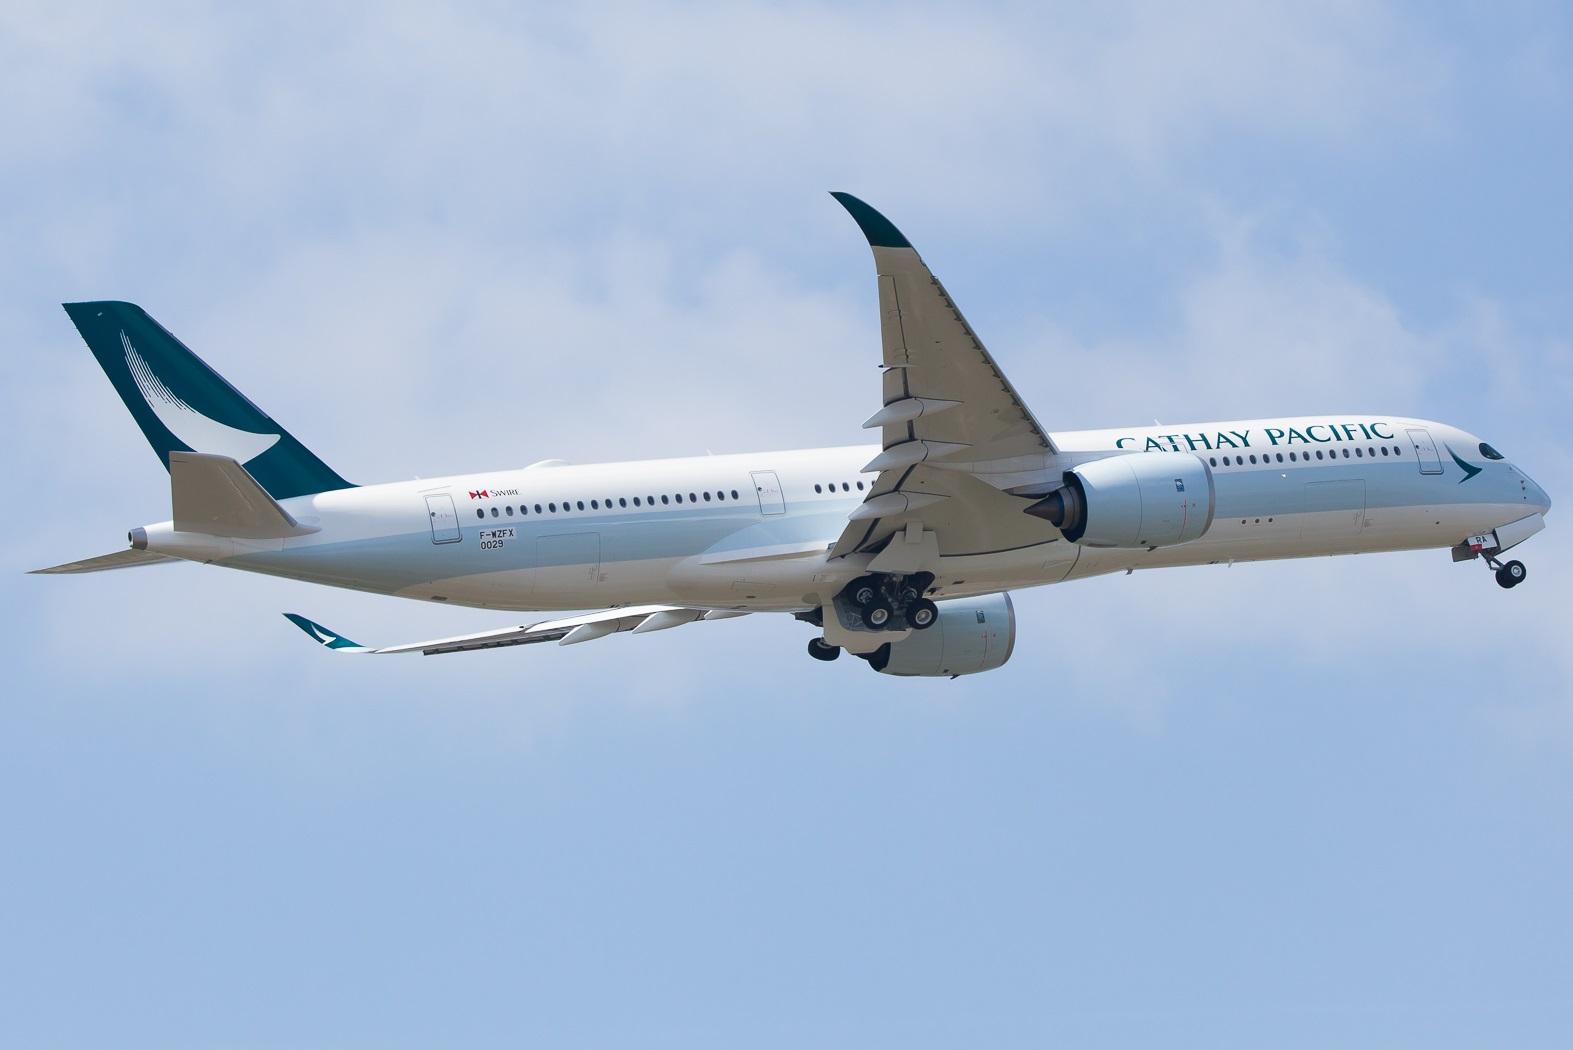 Cathay Pacific Airbus A350-900 Retracting Landing Gear In - AERONEF.NET